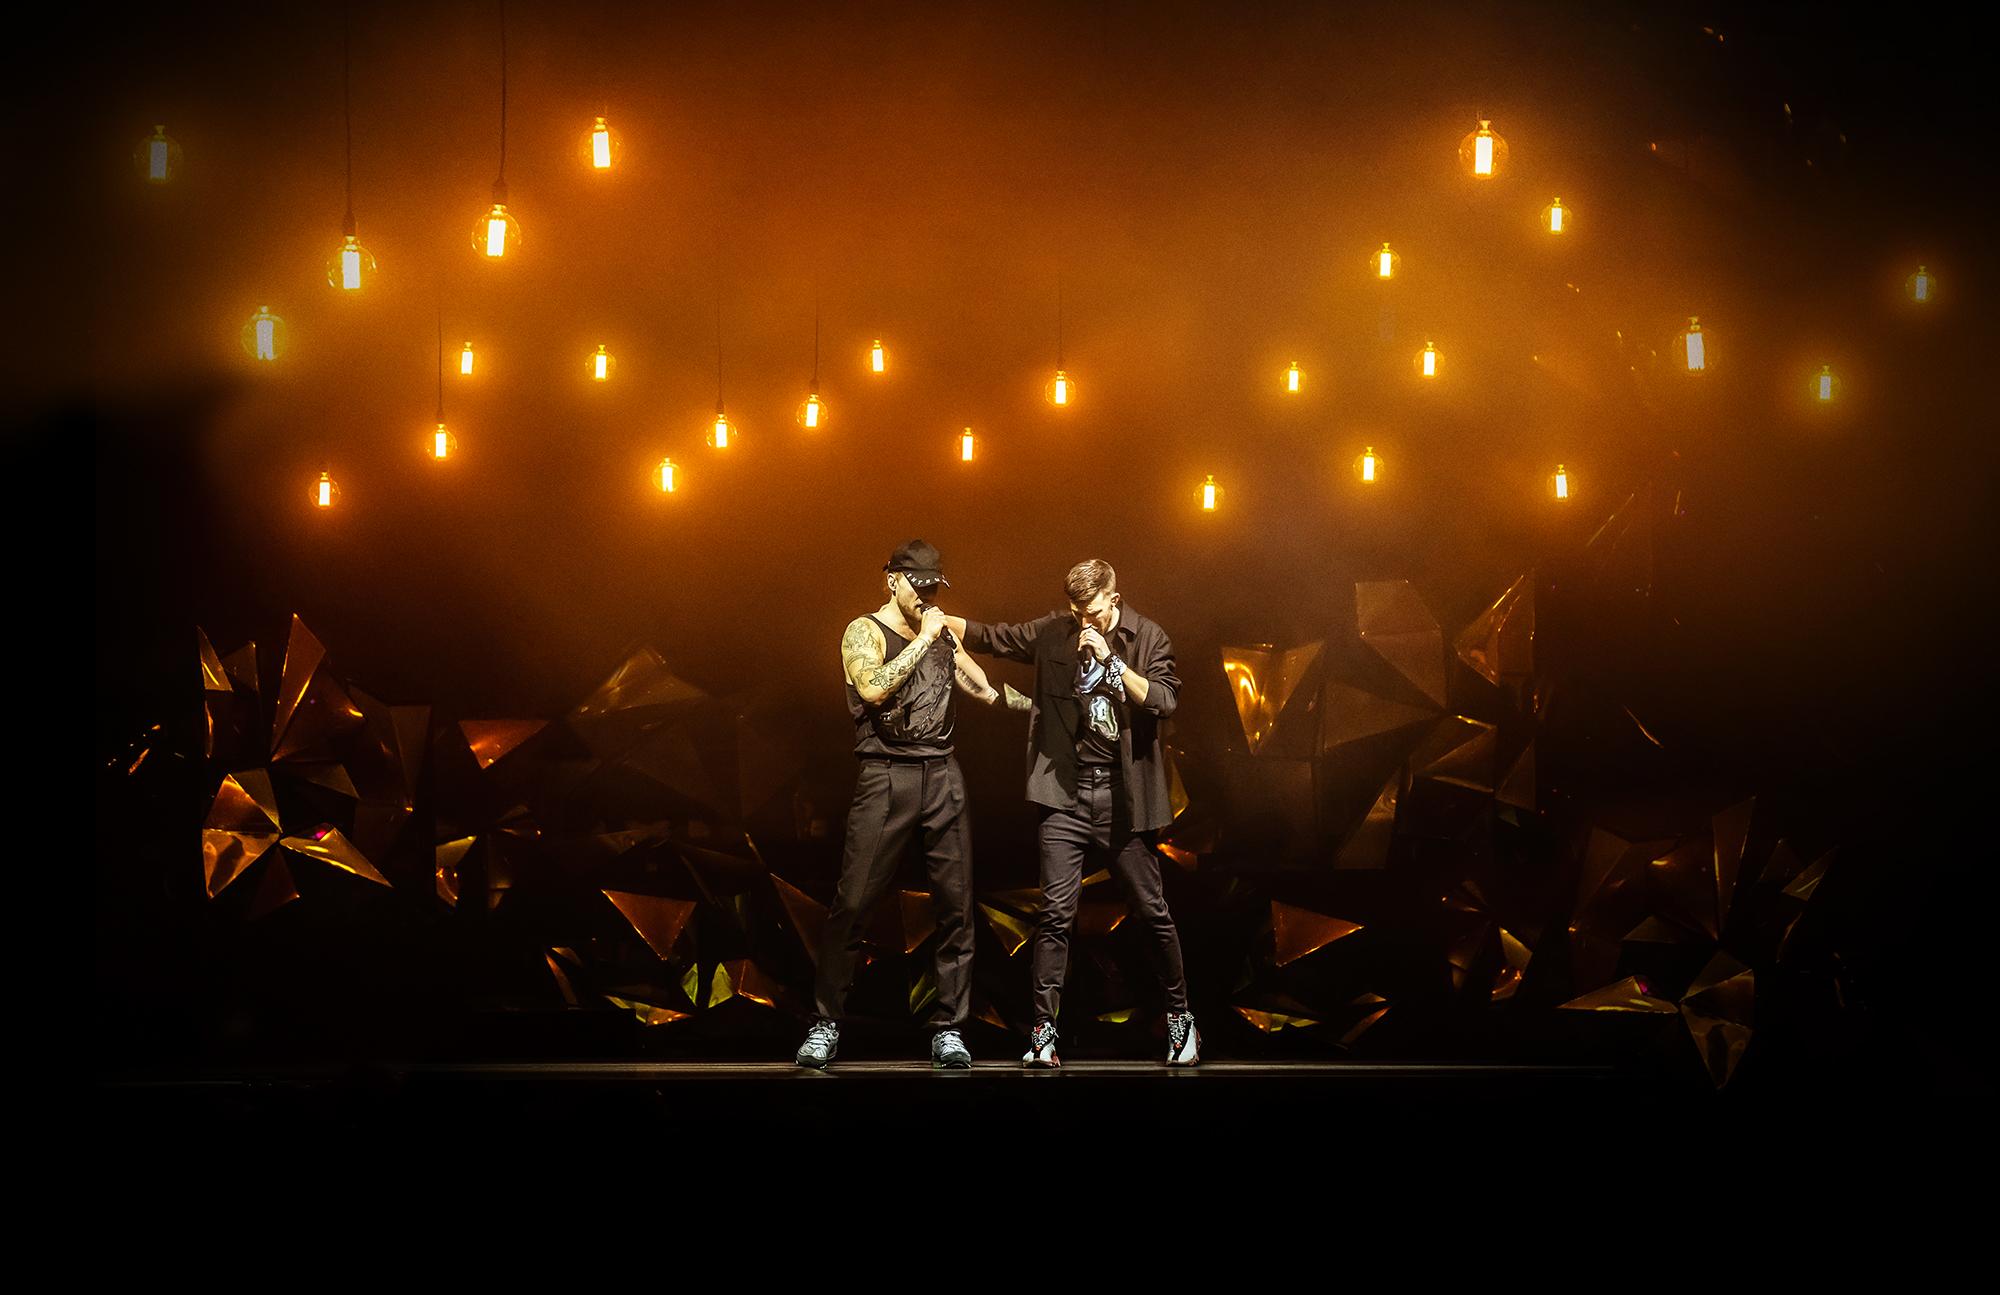 NIK & JAY AKUSTISK TOUR 2020 STARTER I FREDERICIA